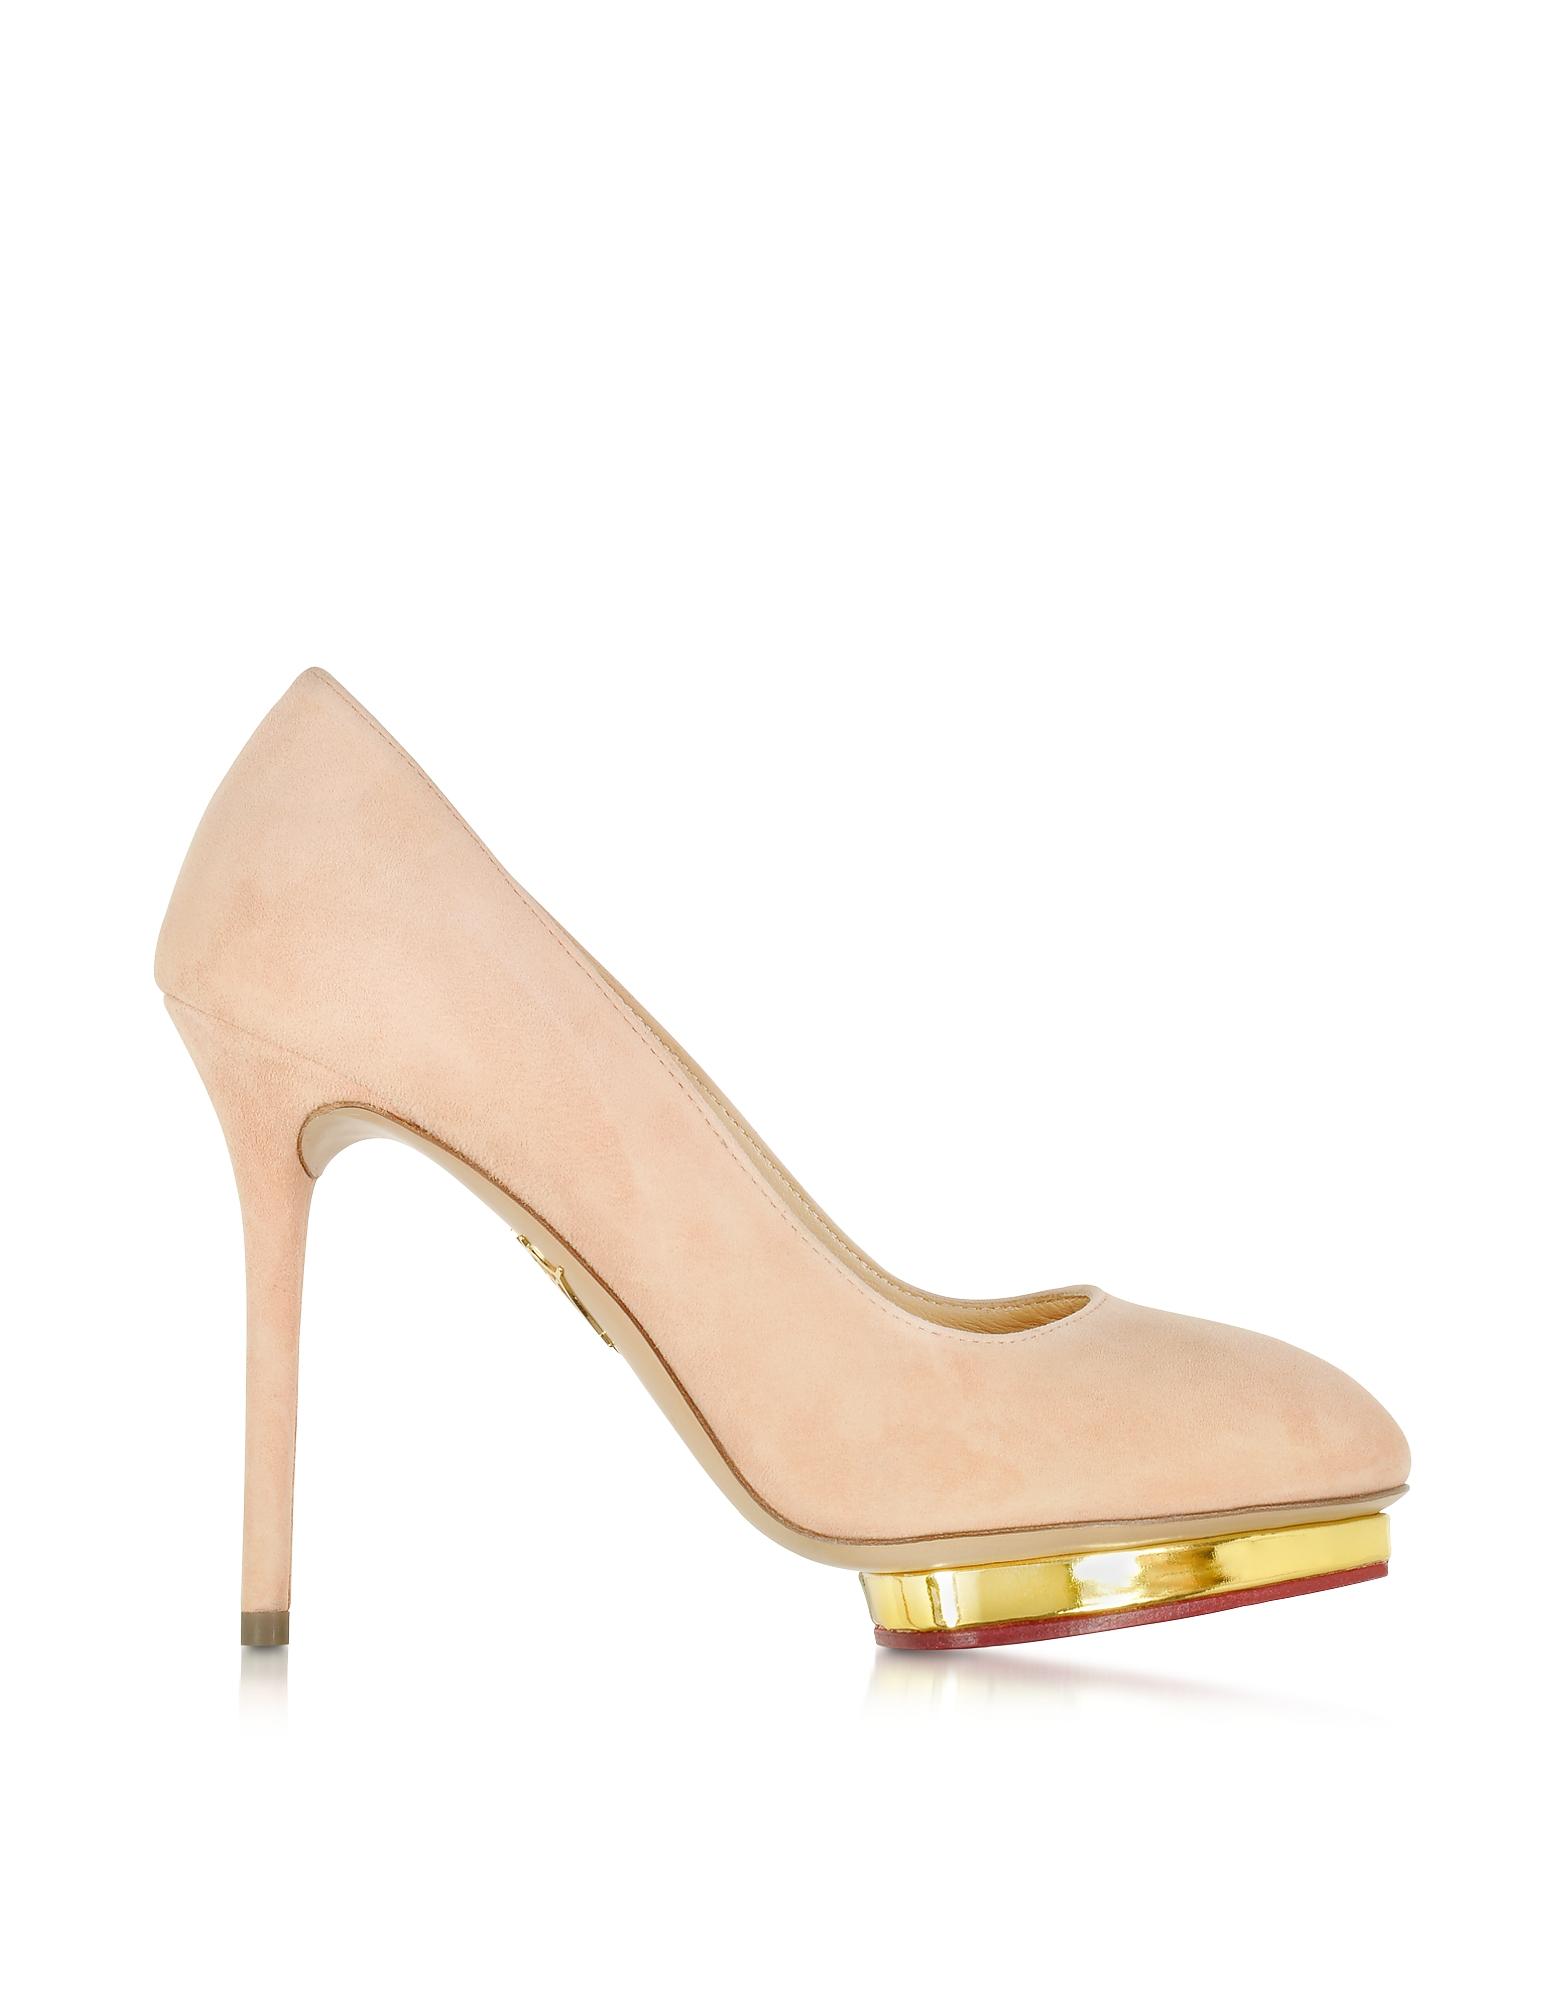 Dotty 110 - Светло-розовые Замшевые Туфли-Лодочки на Платформе